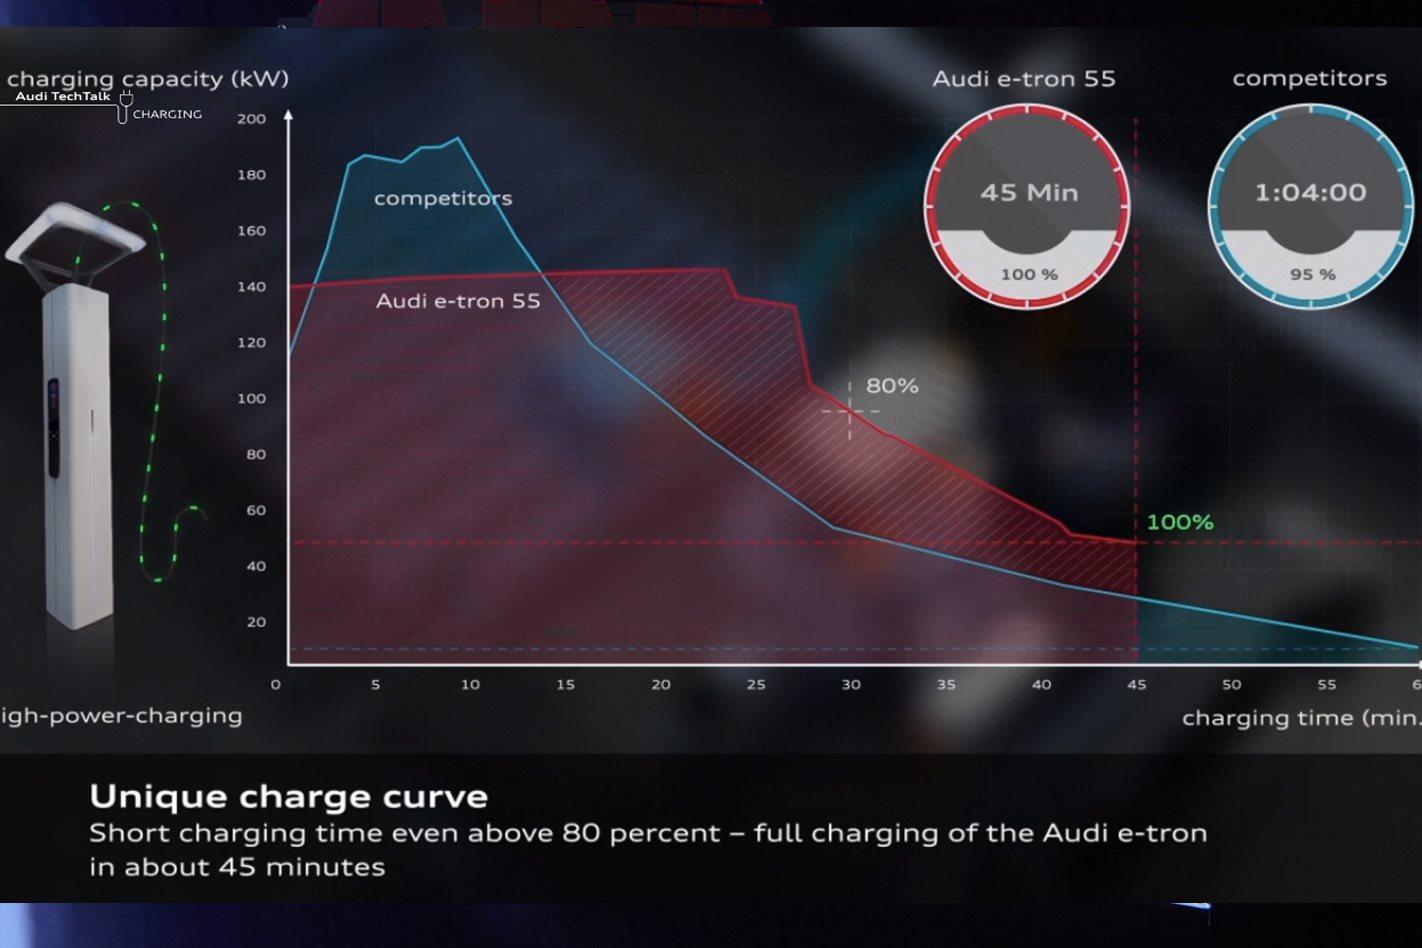 Audi E-Tron charging time versus competitors